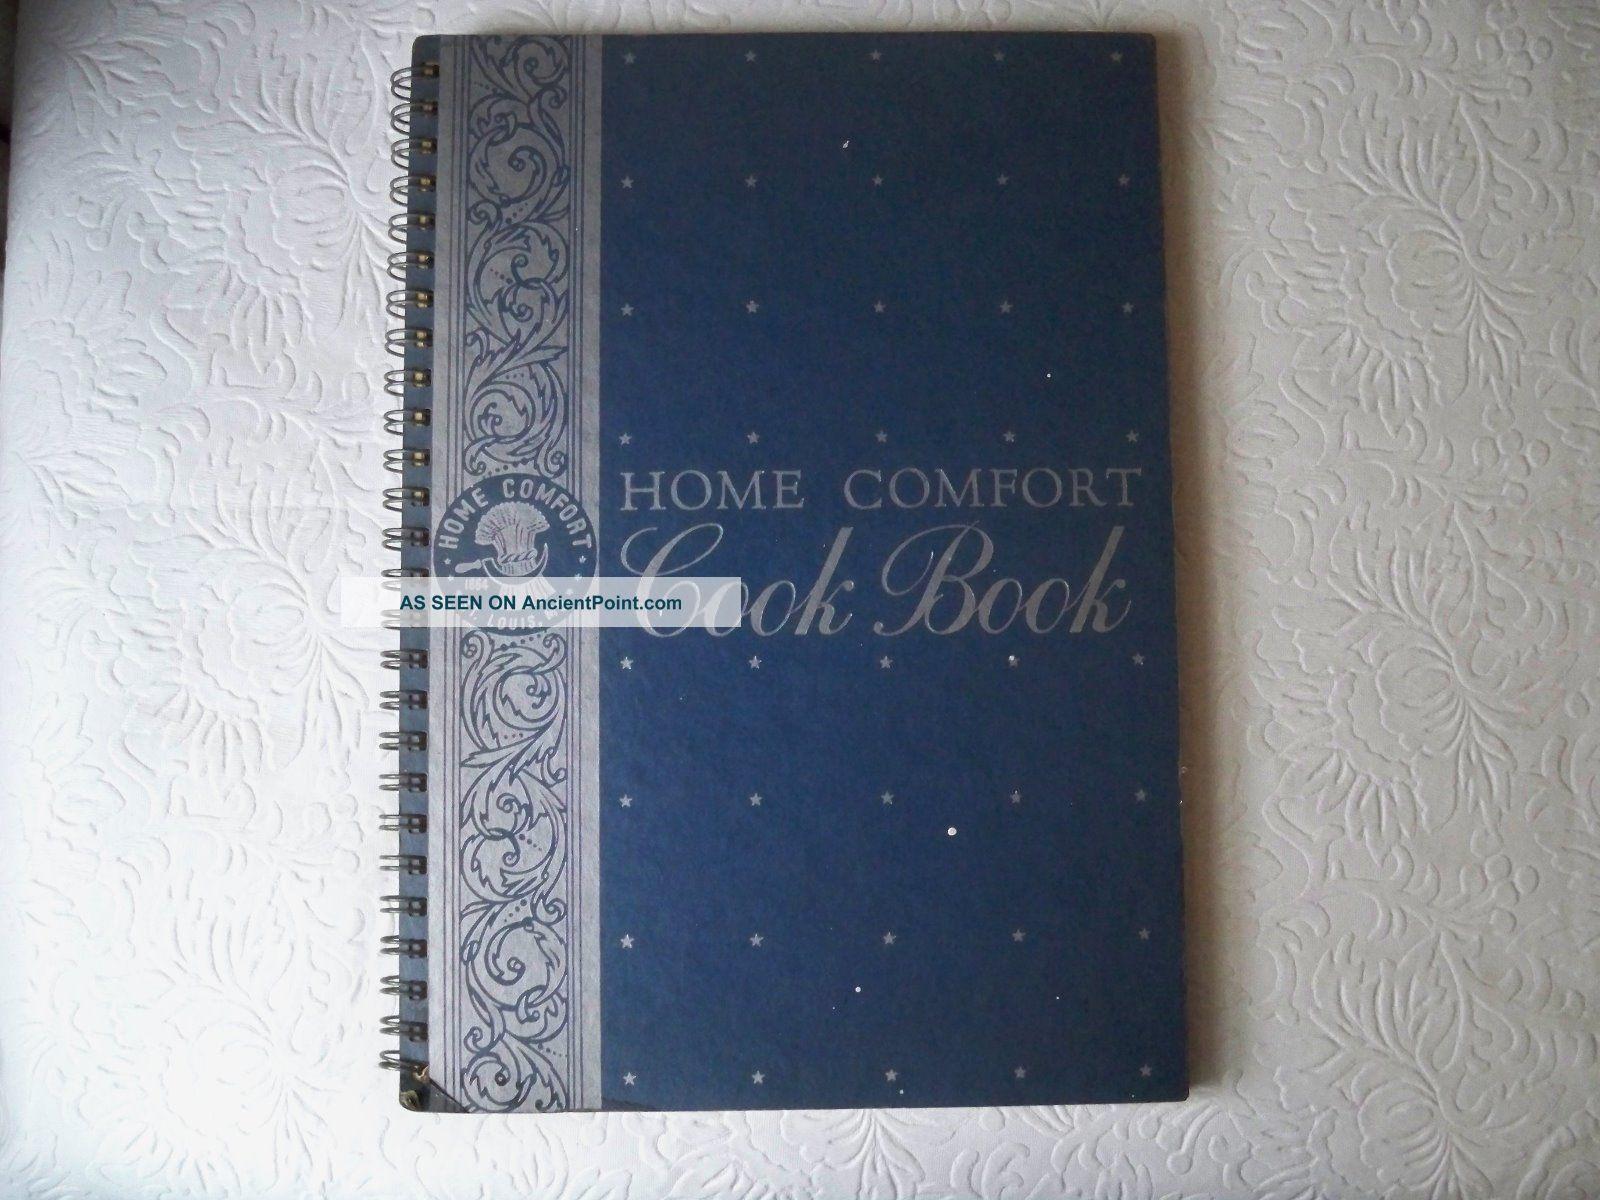 Home Comfort Cook Cook 1938 Vintage Cookbook For Home Comfort Ranges Usa Stoves photo